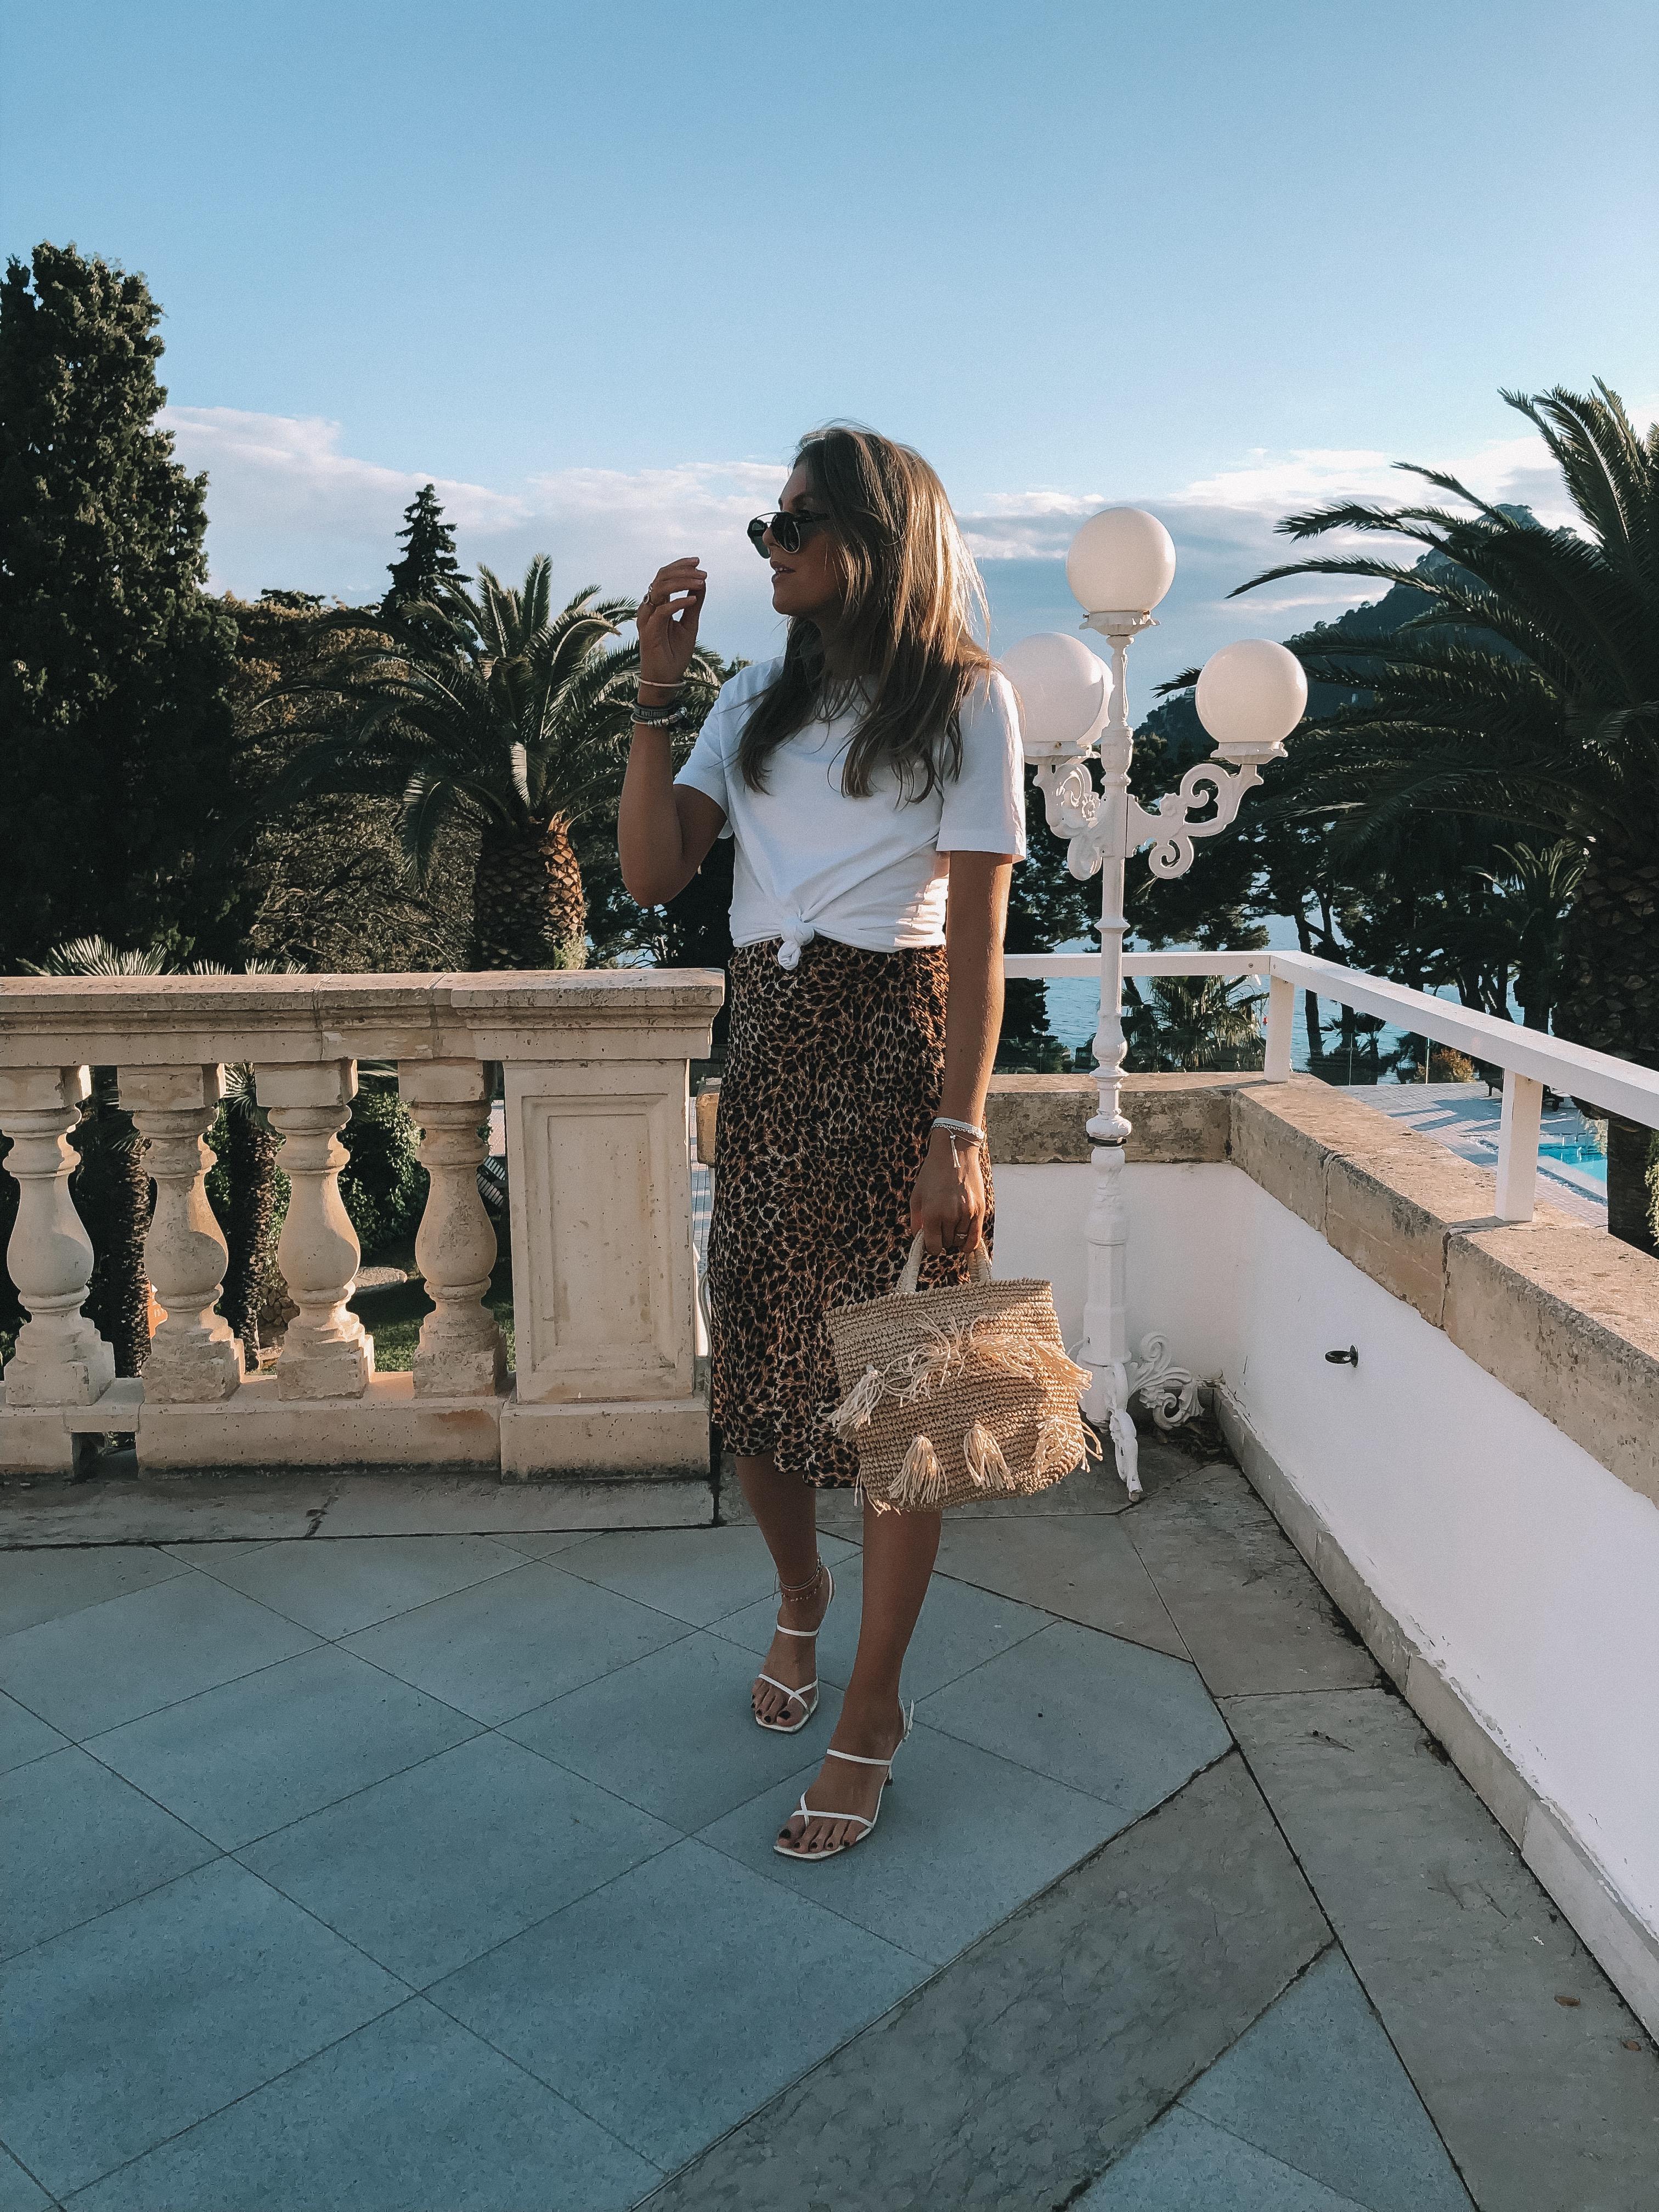 Leopard Print Nanushka Midi Skirt - Holiday Outfit Idea in Mallorca - Royal Hideaway Hotel Formentor